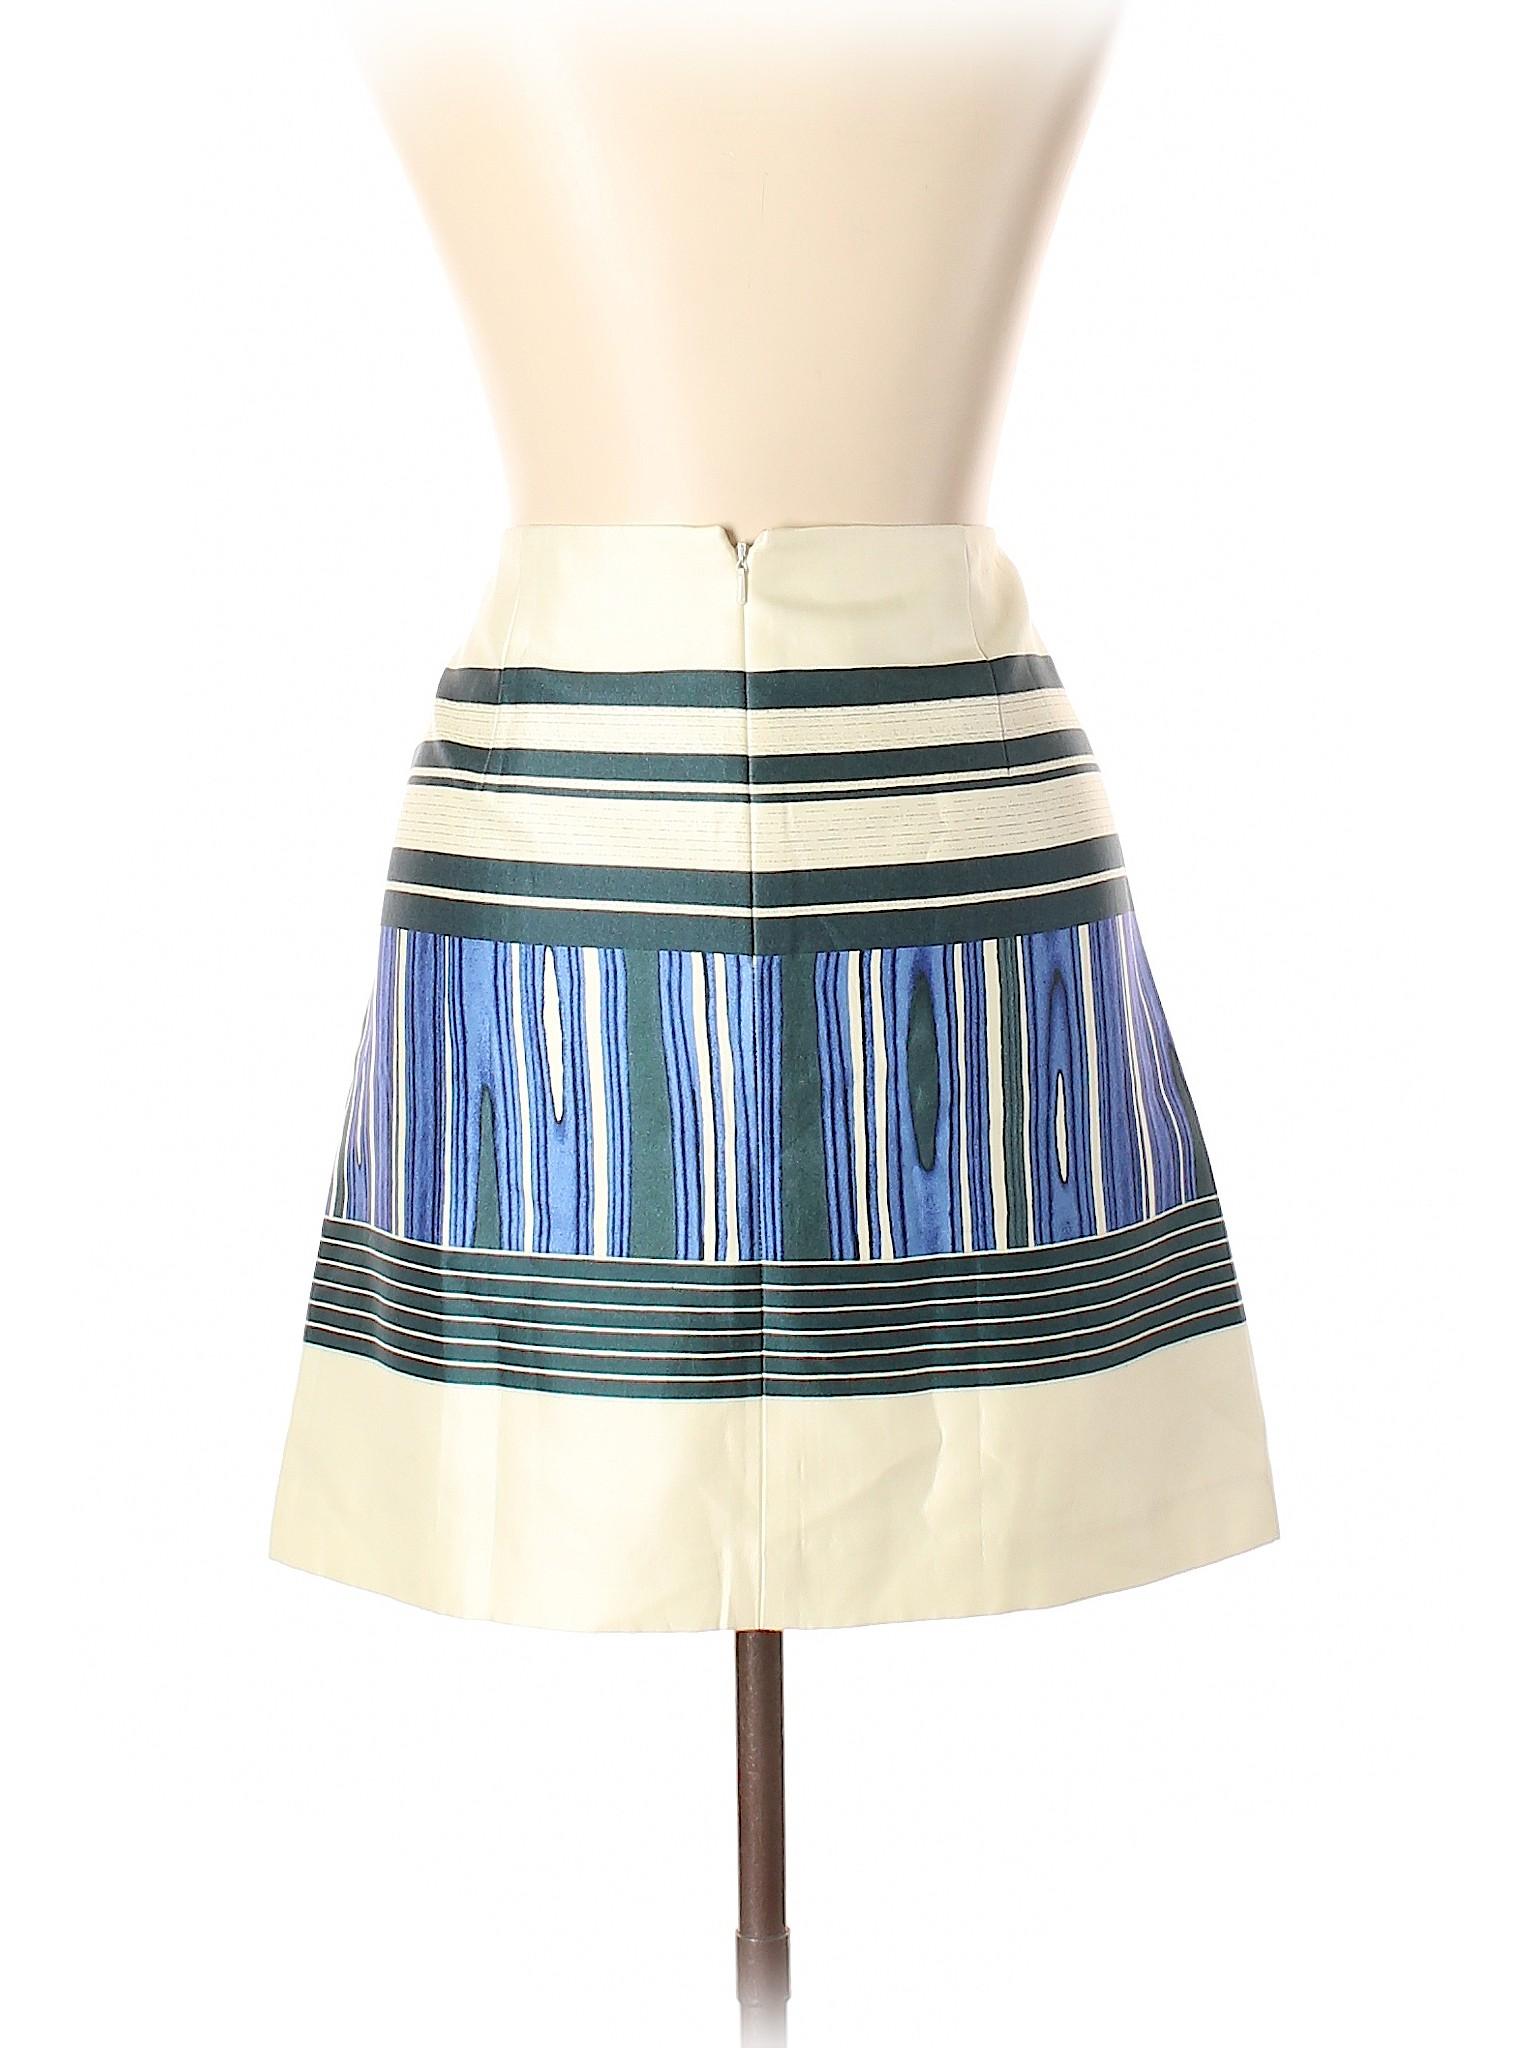 Boutique Silk Boutique Silk Skirt Boutique Boutique Skirt Skirt Silk Silk dOfqEw4Sd